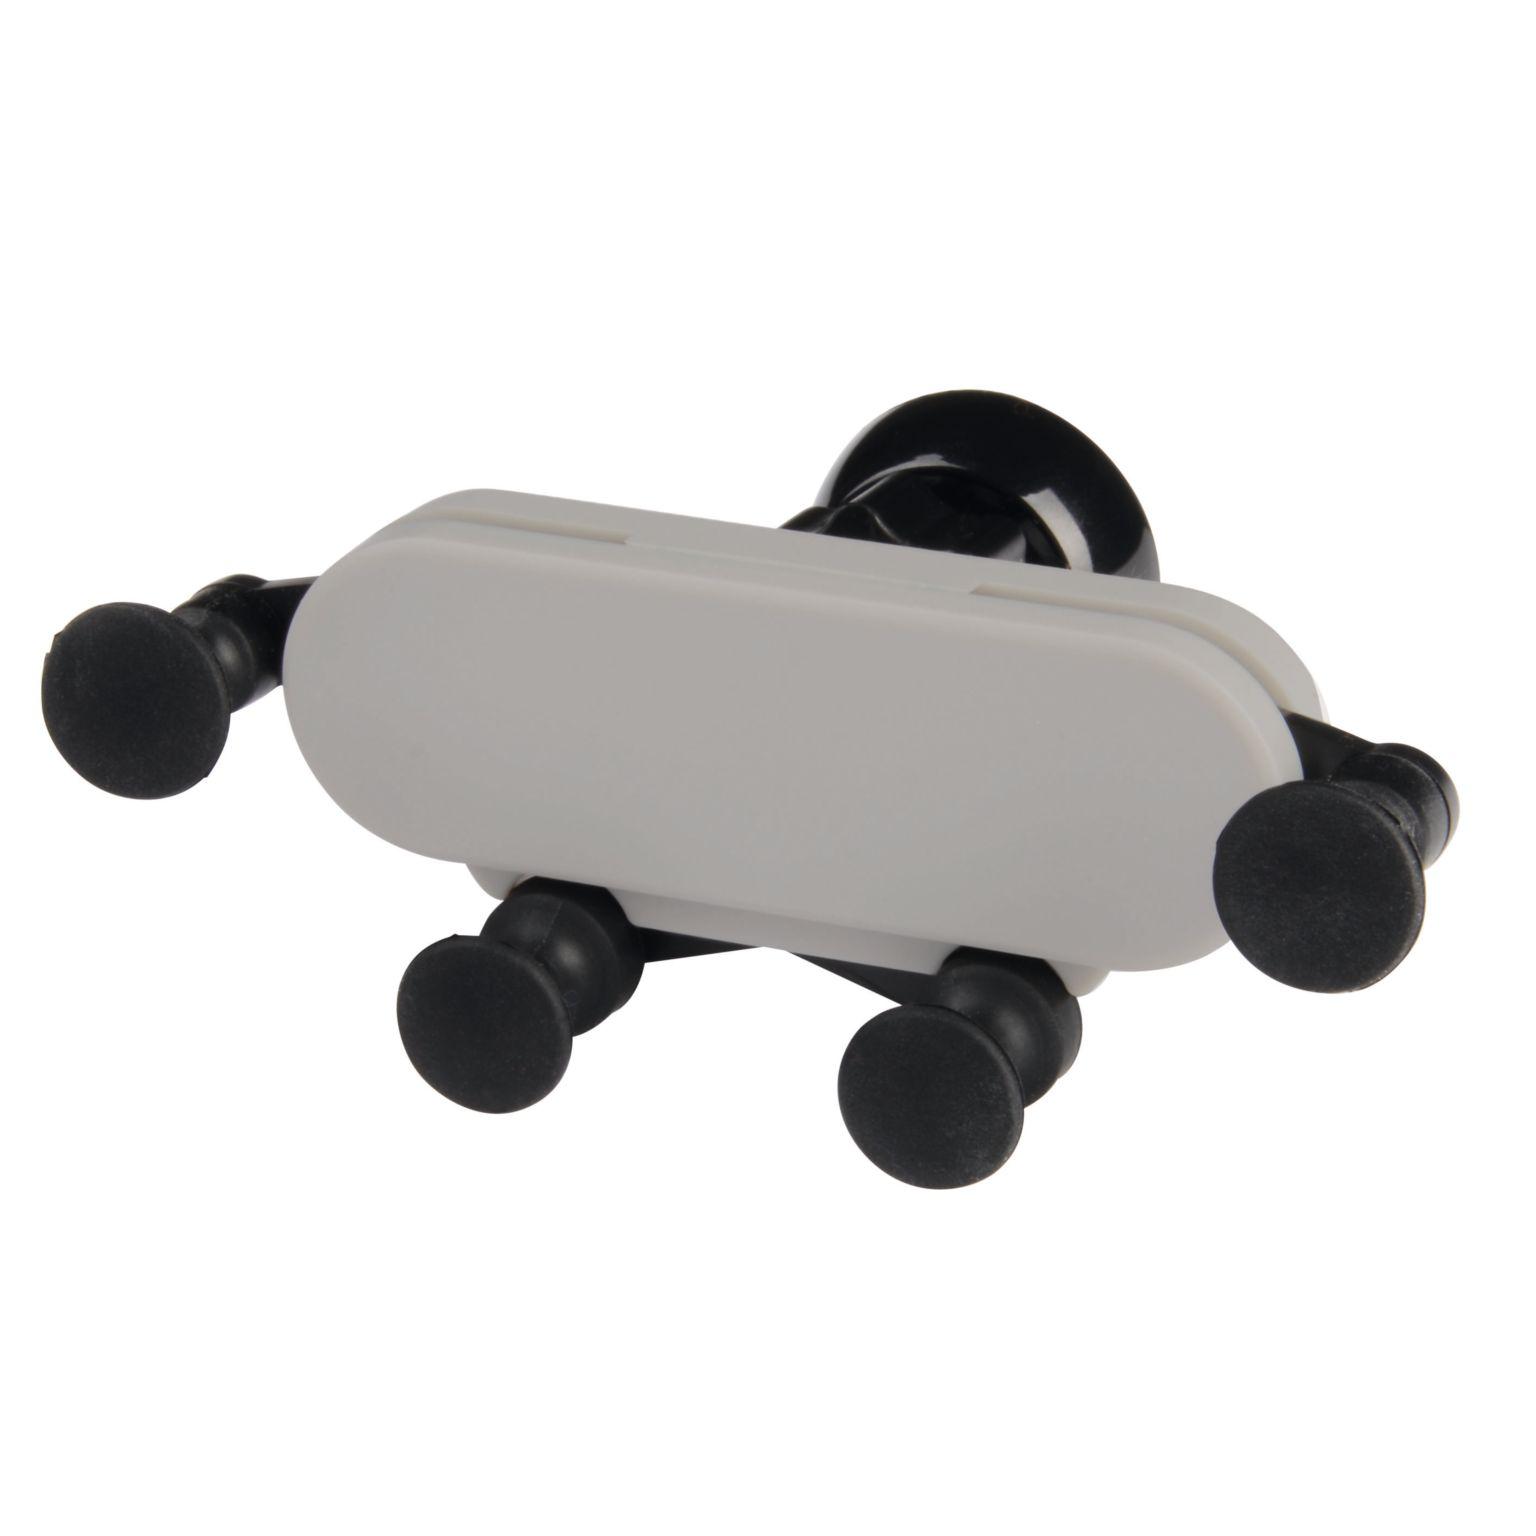 Car smartphone holder CLAW